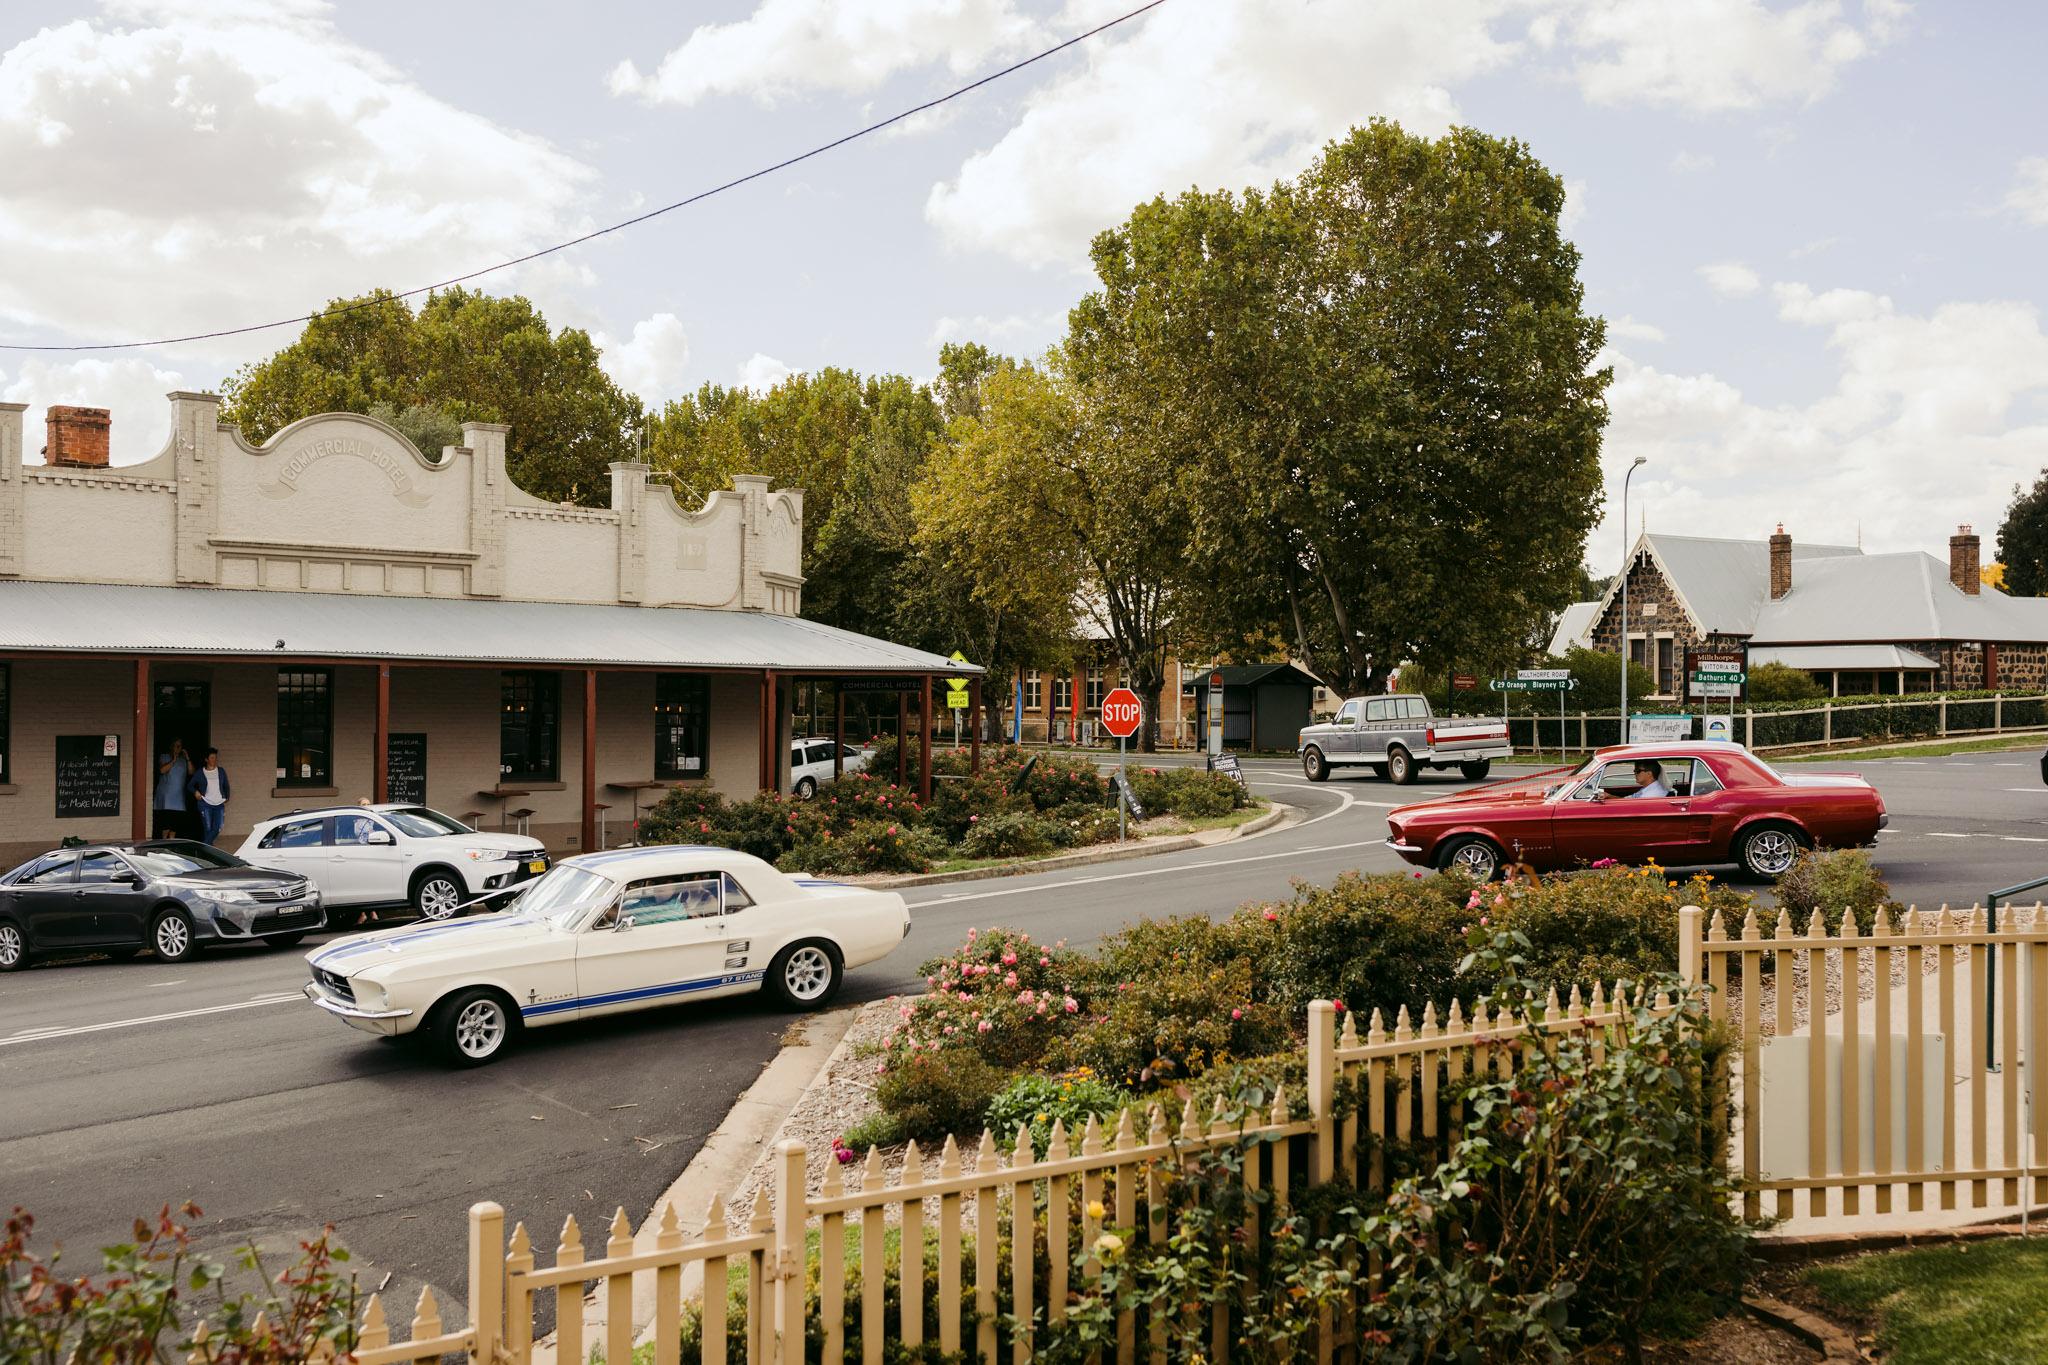 Erin Latimore Mudgee Canberra Wedding Photographer ROSEBANK GUESTHOUSE OLD THEATRE TONIC MILLTHORPE_151.JPG